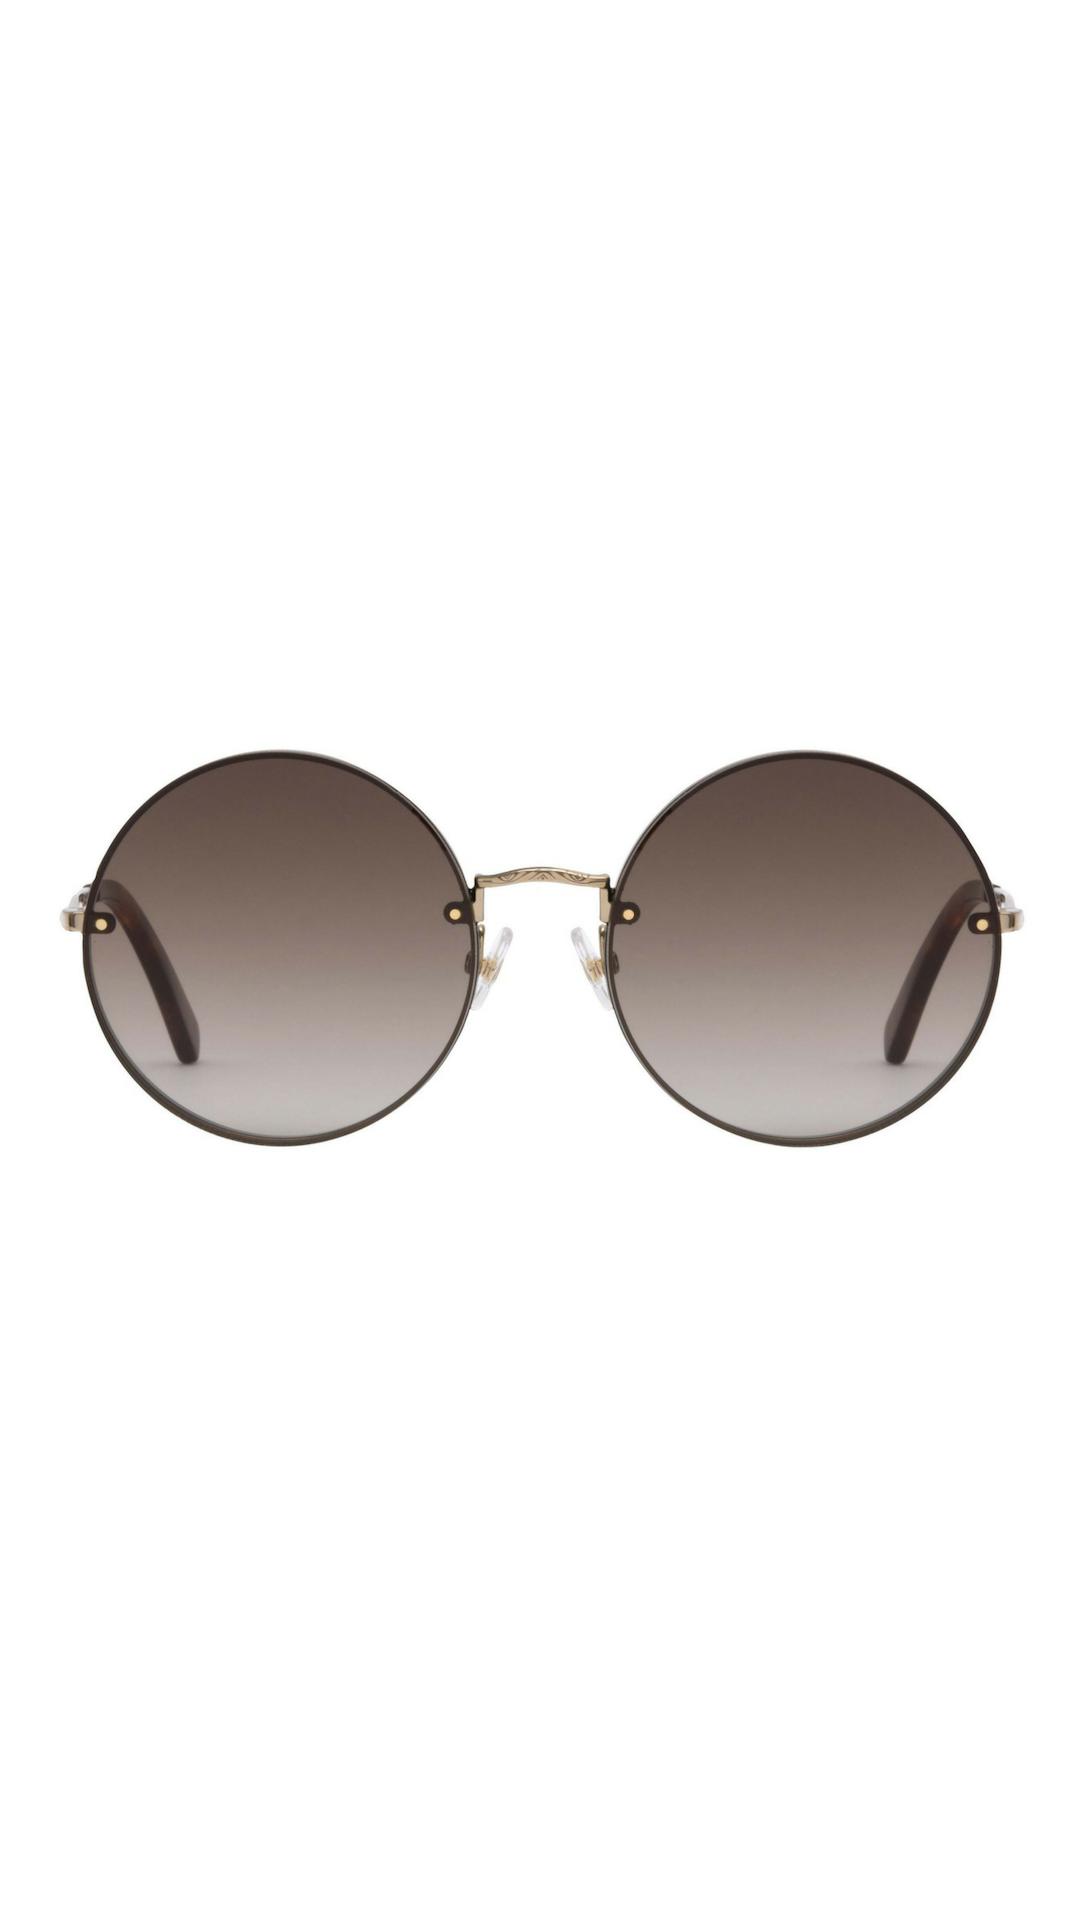 1fe4e8dfef Gloria Metal Round Sunglasses | Rebecca Minkoff, circle metal sunglasses,  designer sunglasses, gold circle sunglasses, gold round sunglasses, gold  metal ...